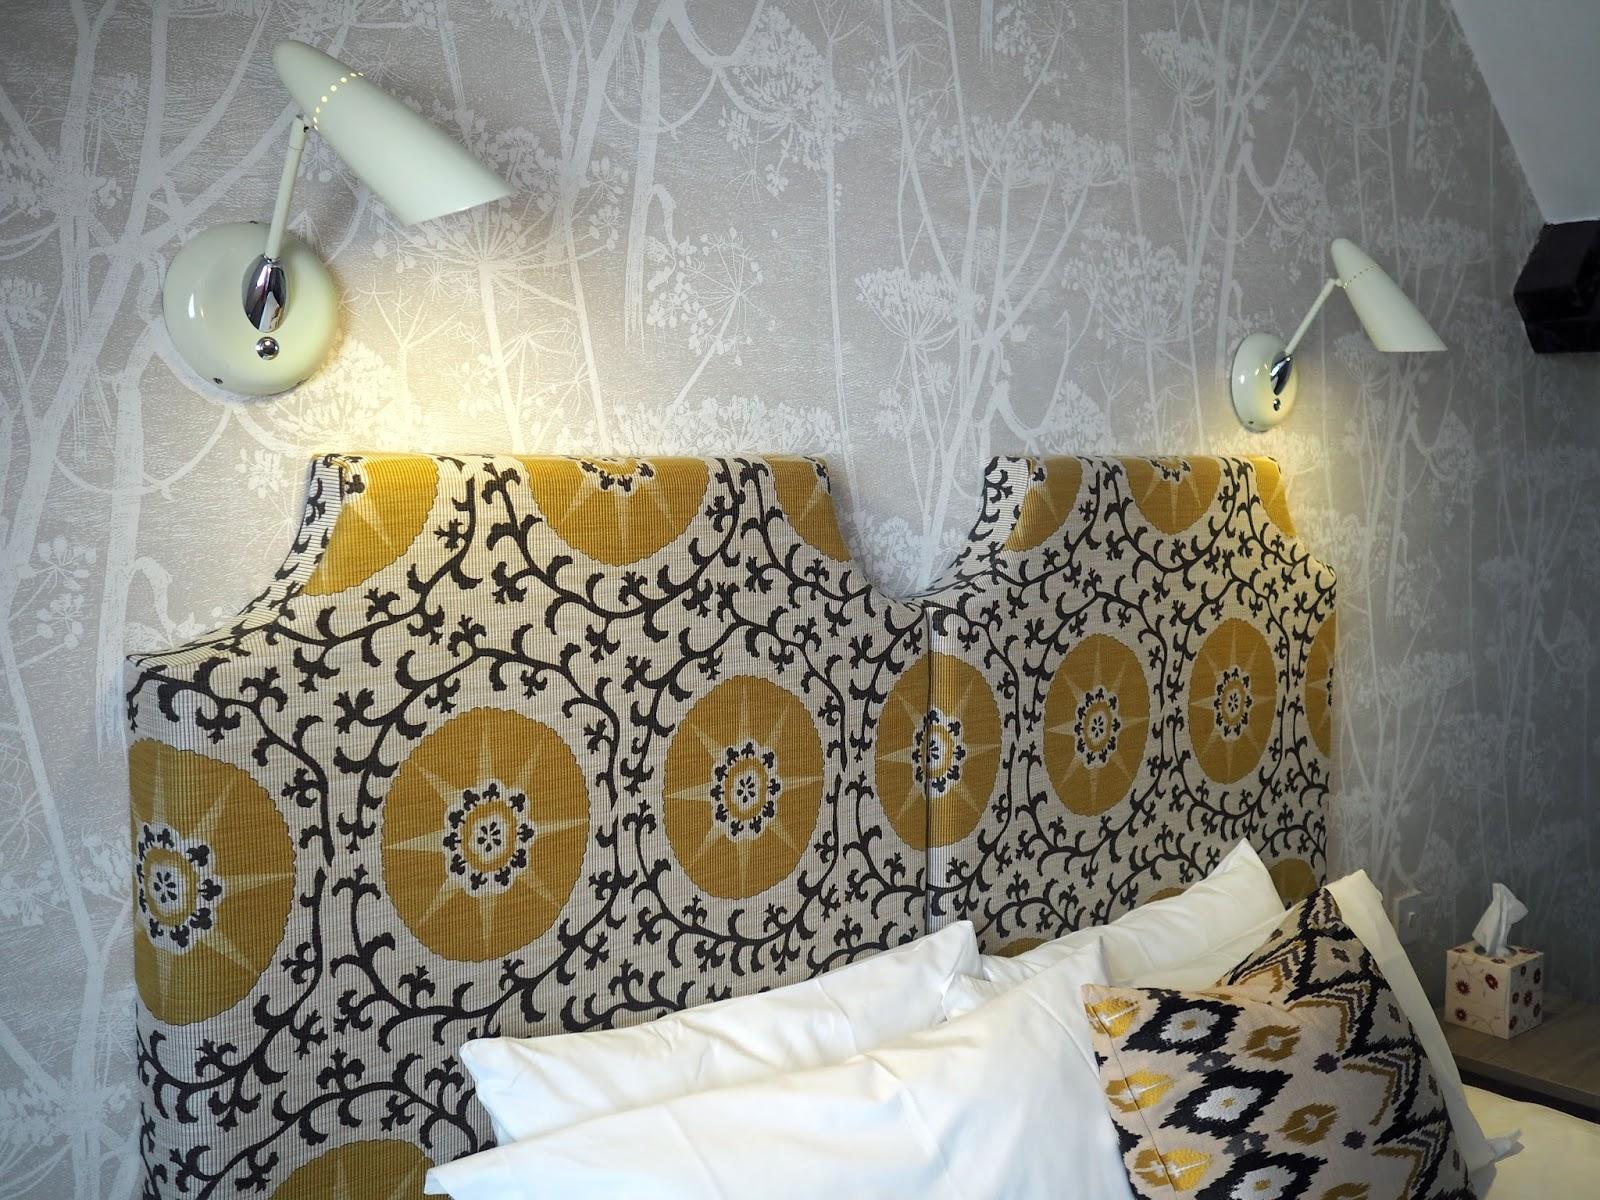 Hotel suite bedroom at Monk Bar Hotel, York, soft furnishings